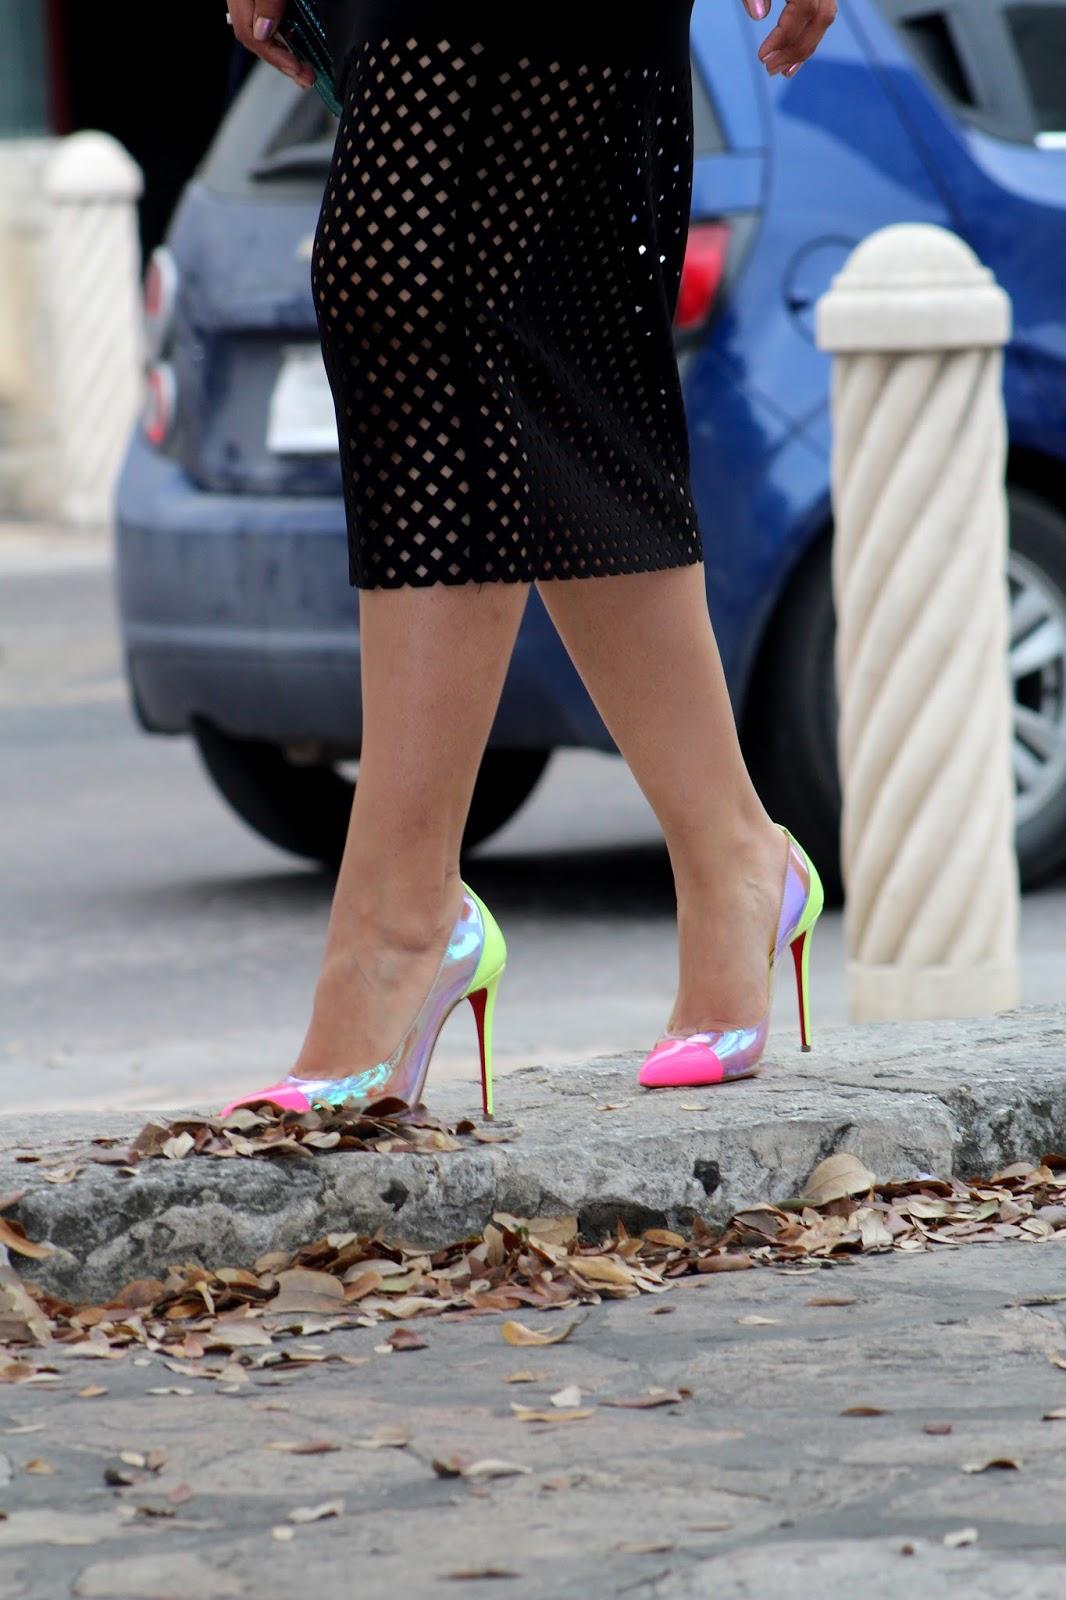 Christian Louboutin Neon Shoes